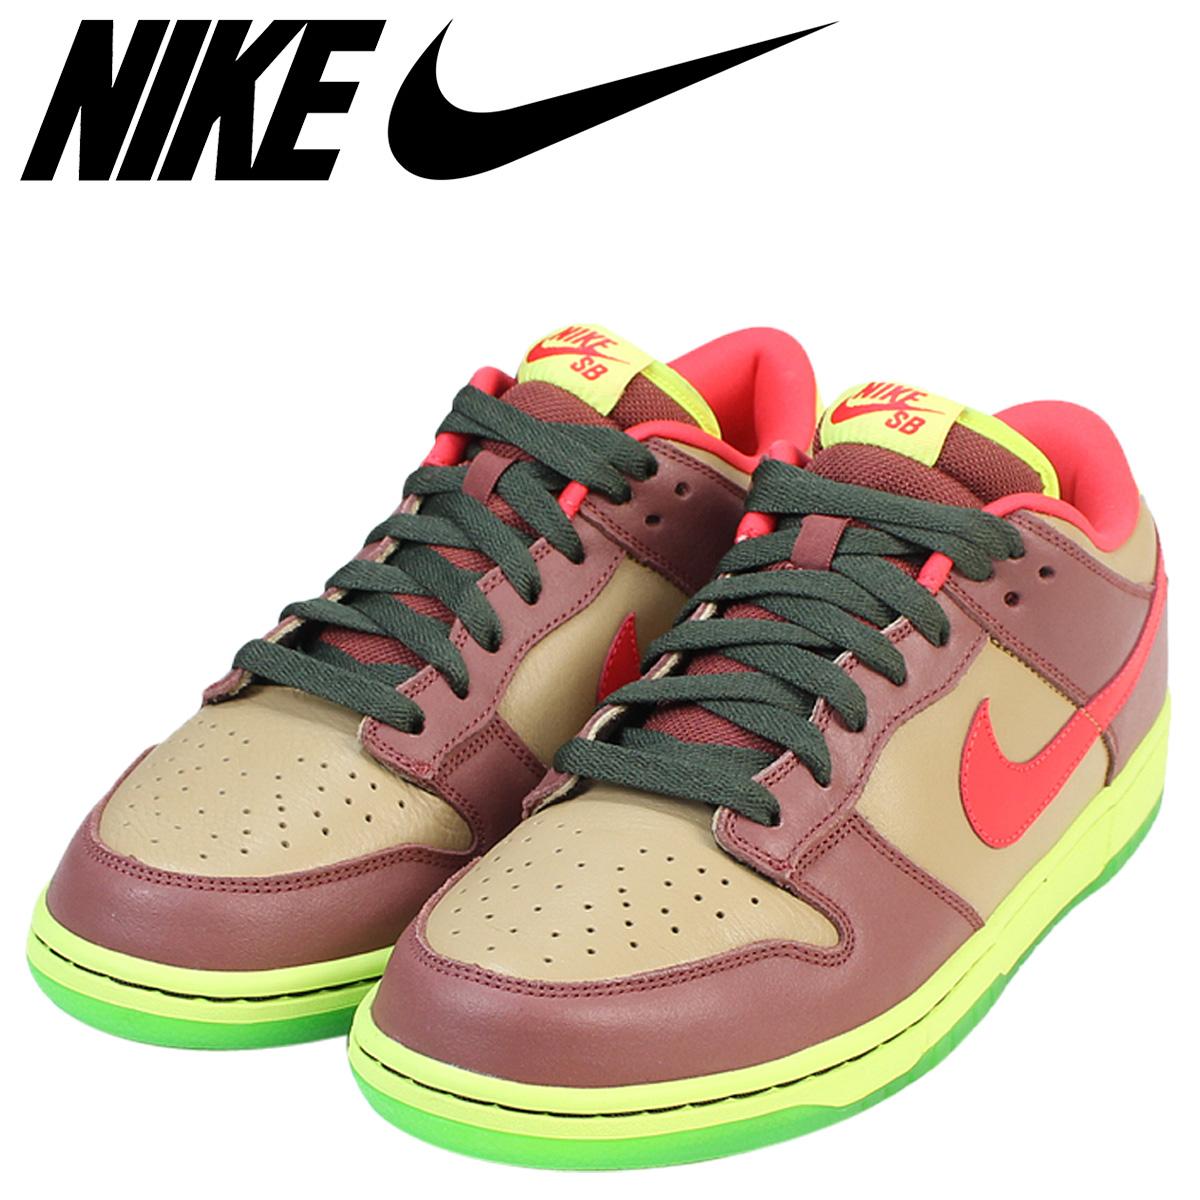 best sneakers ce116 6ef70 Nike NIKE SB dunk low sneakers DUNK LOW PREMIUM TOXIC AVENGERS men  313,170-261 shoes brown